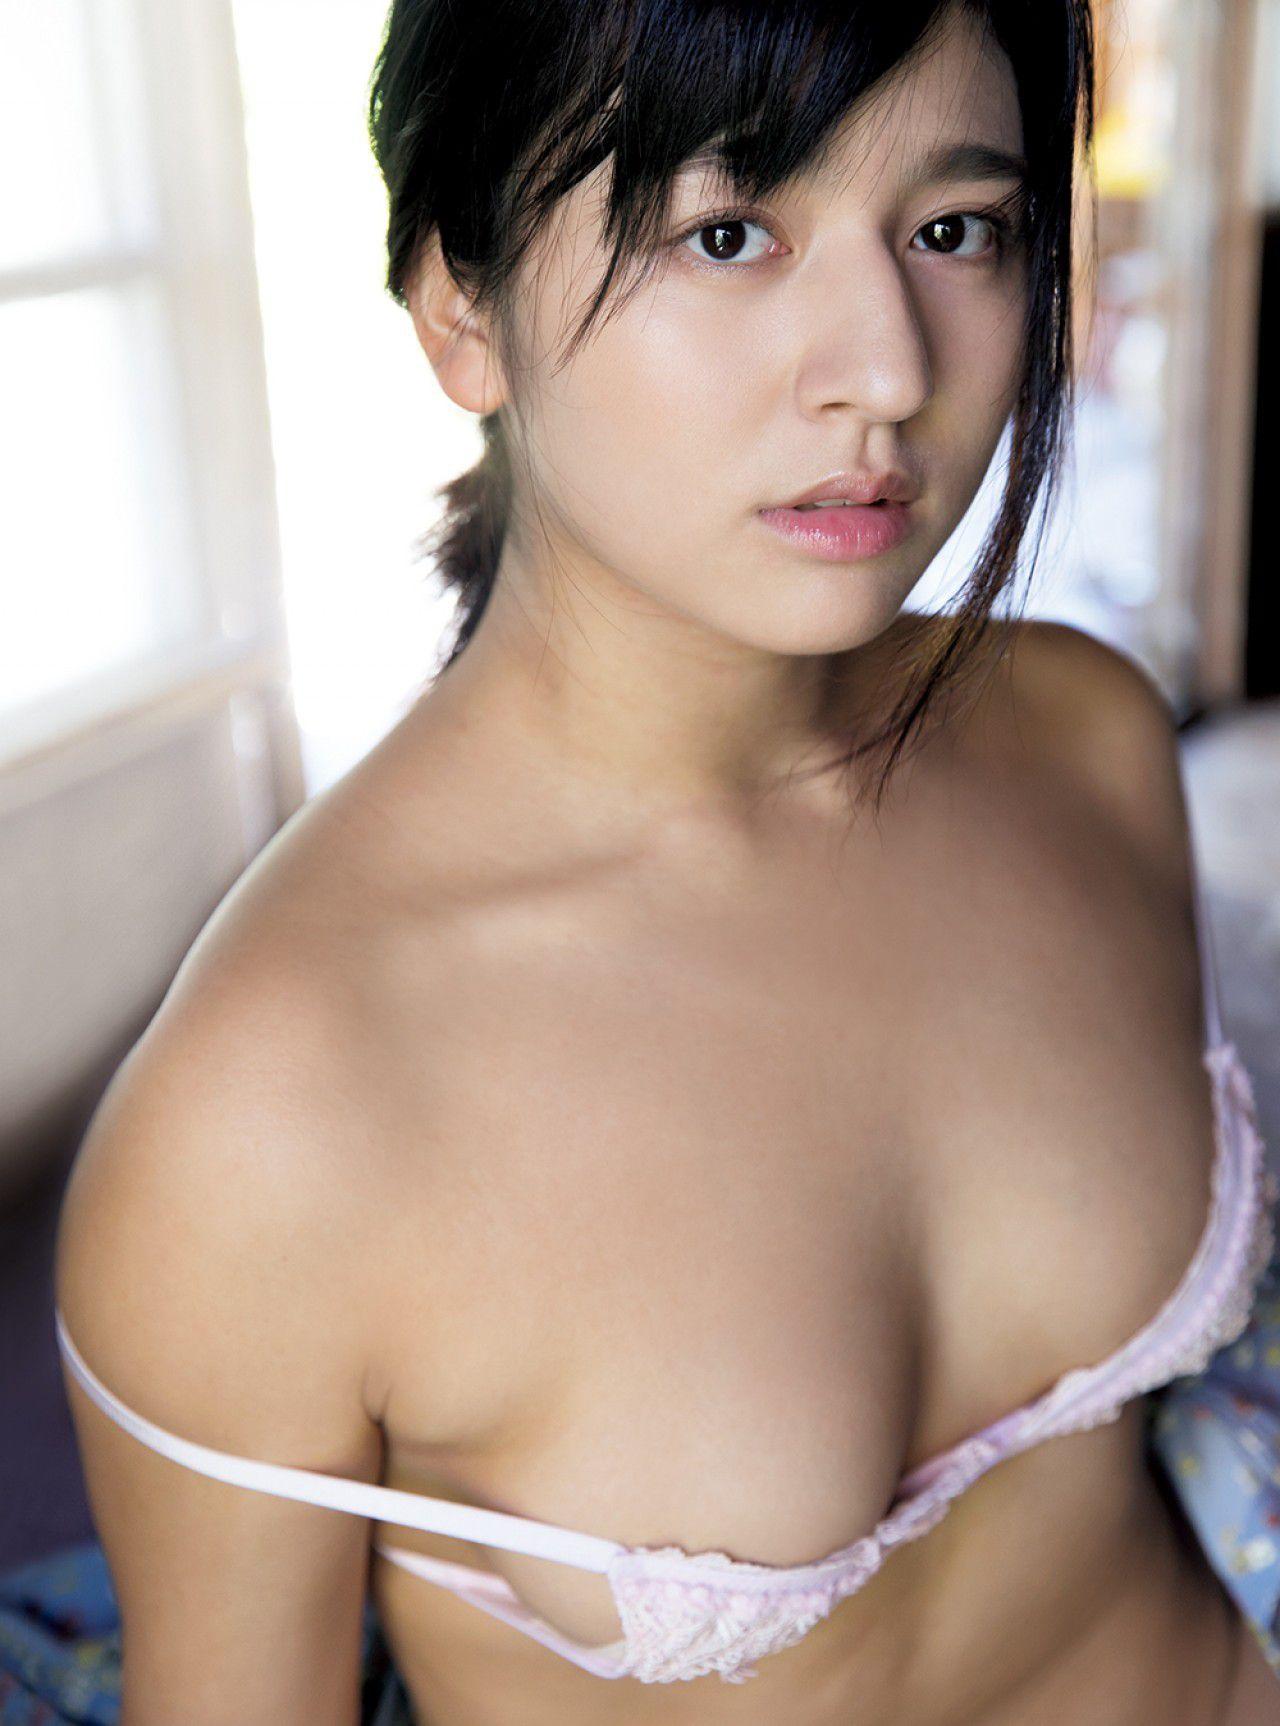 VOL.510 [FRIDAY]美乳日本少妇:德江加奈(徳江かな)超高清写真套图(8P)